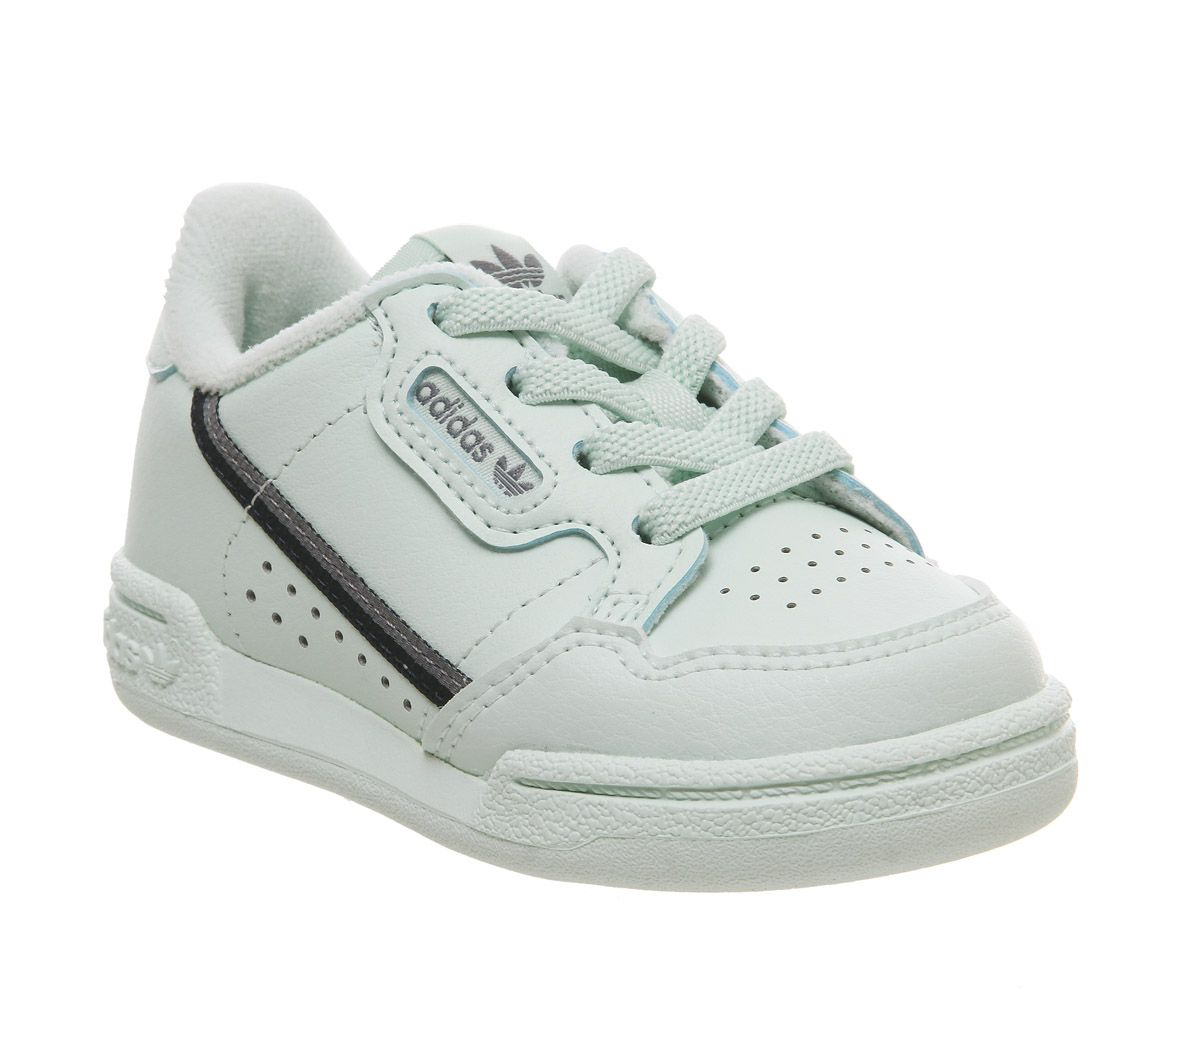 9e12887bb4b2 Adidas 80s Continental Infant Trainers Ice Mint Vista Grey - Unisex